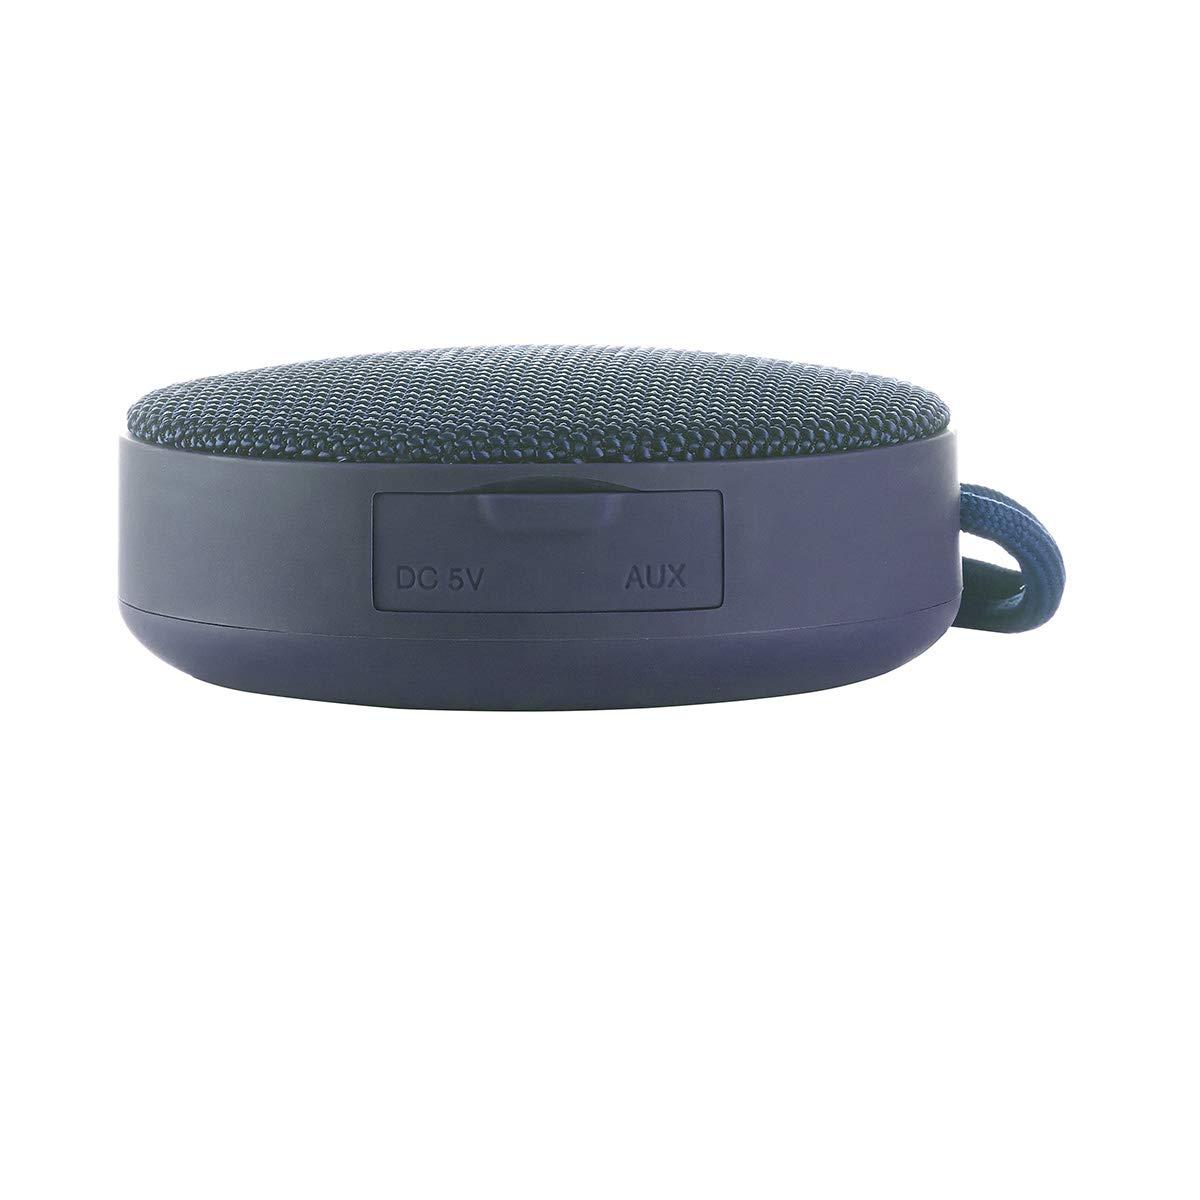 Altavoz inal/ámbrico Vieta Pro Round Up Bluetooth, radio FM, reproductor USB, entrada micro SD, auxiliar, micr/ófono integrado azul